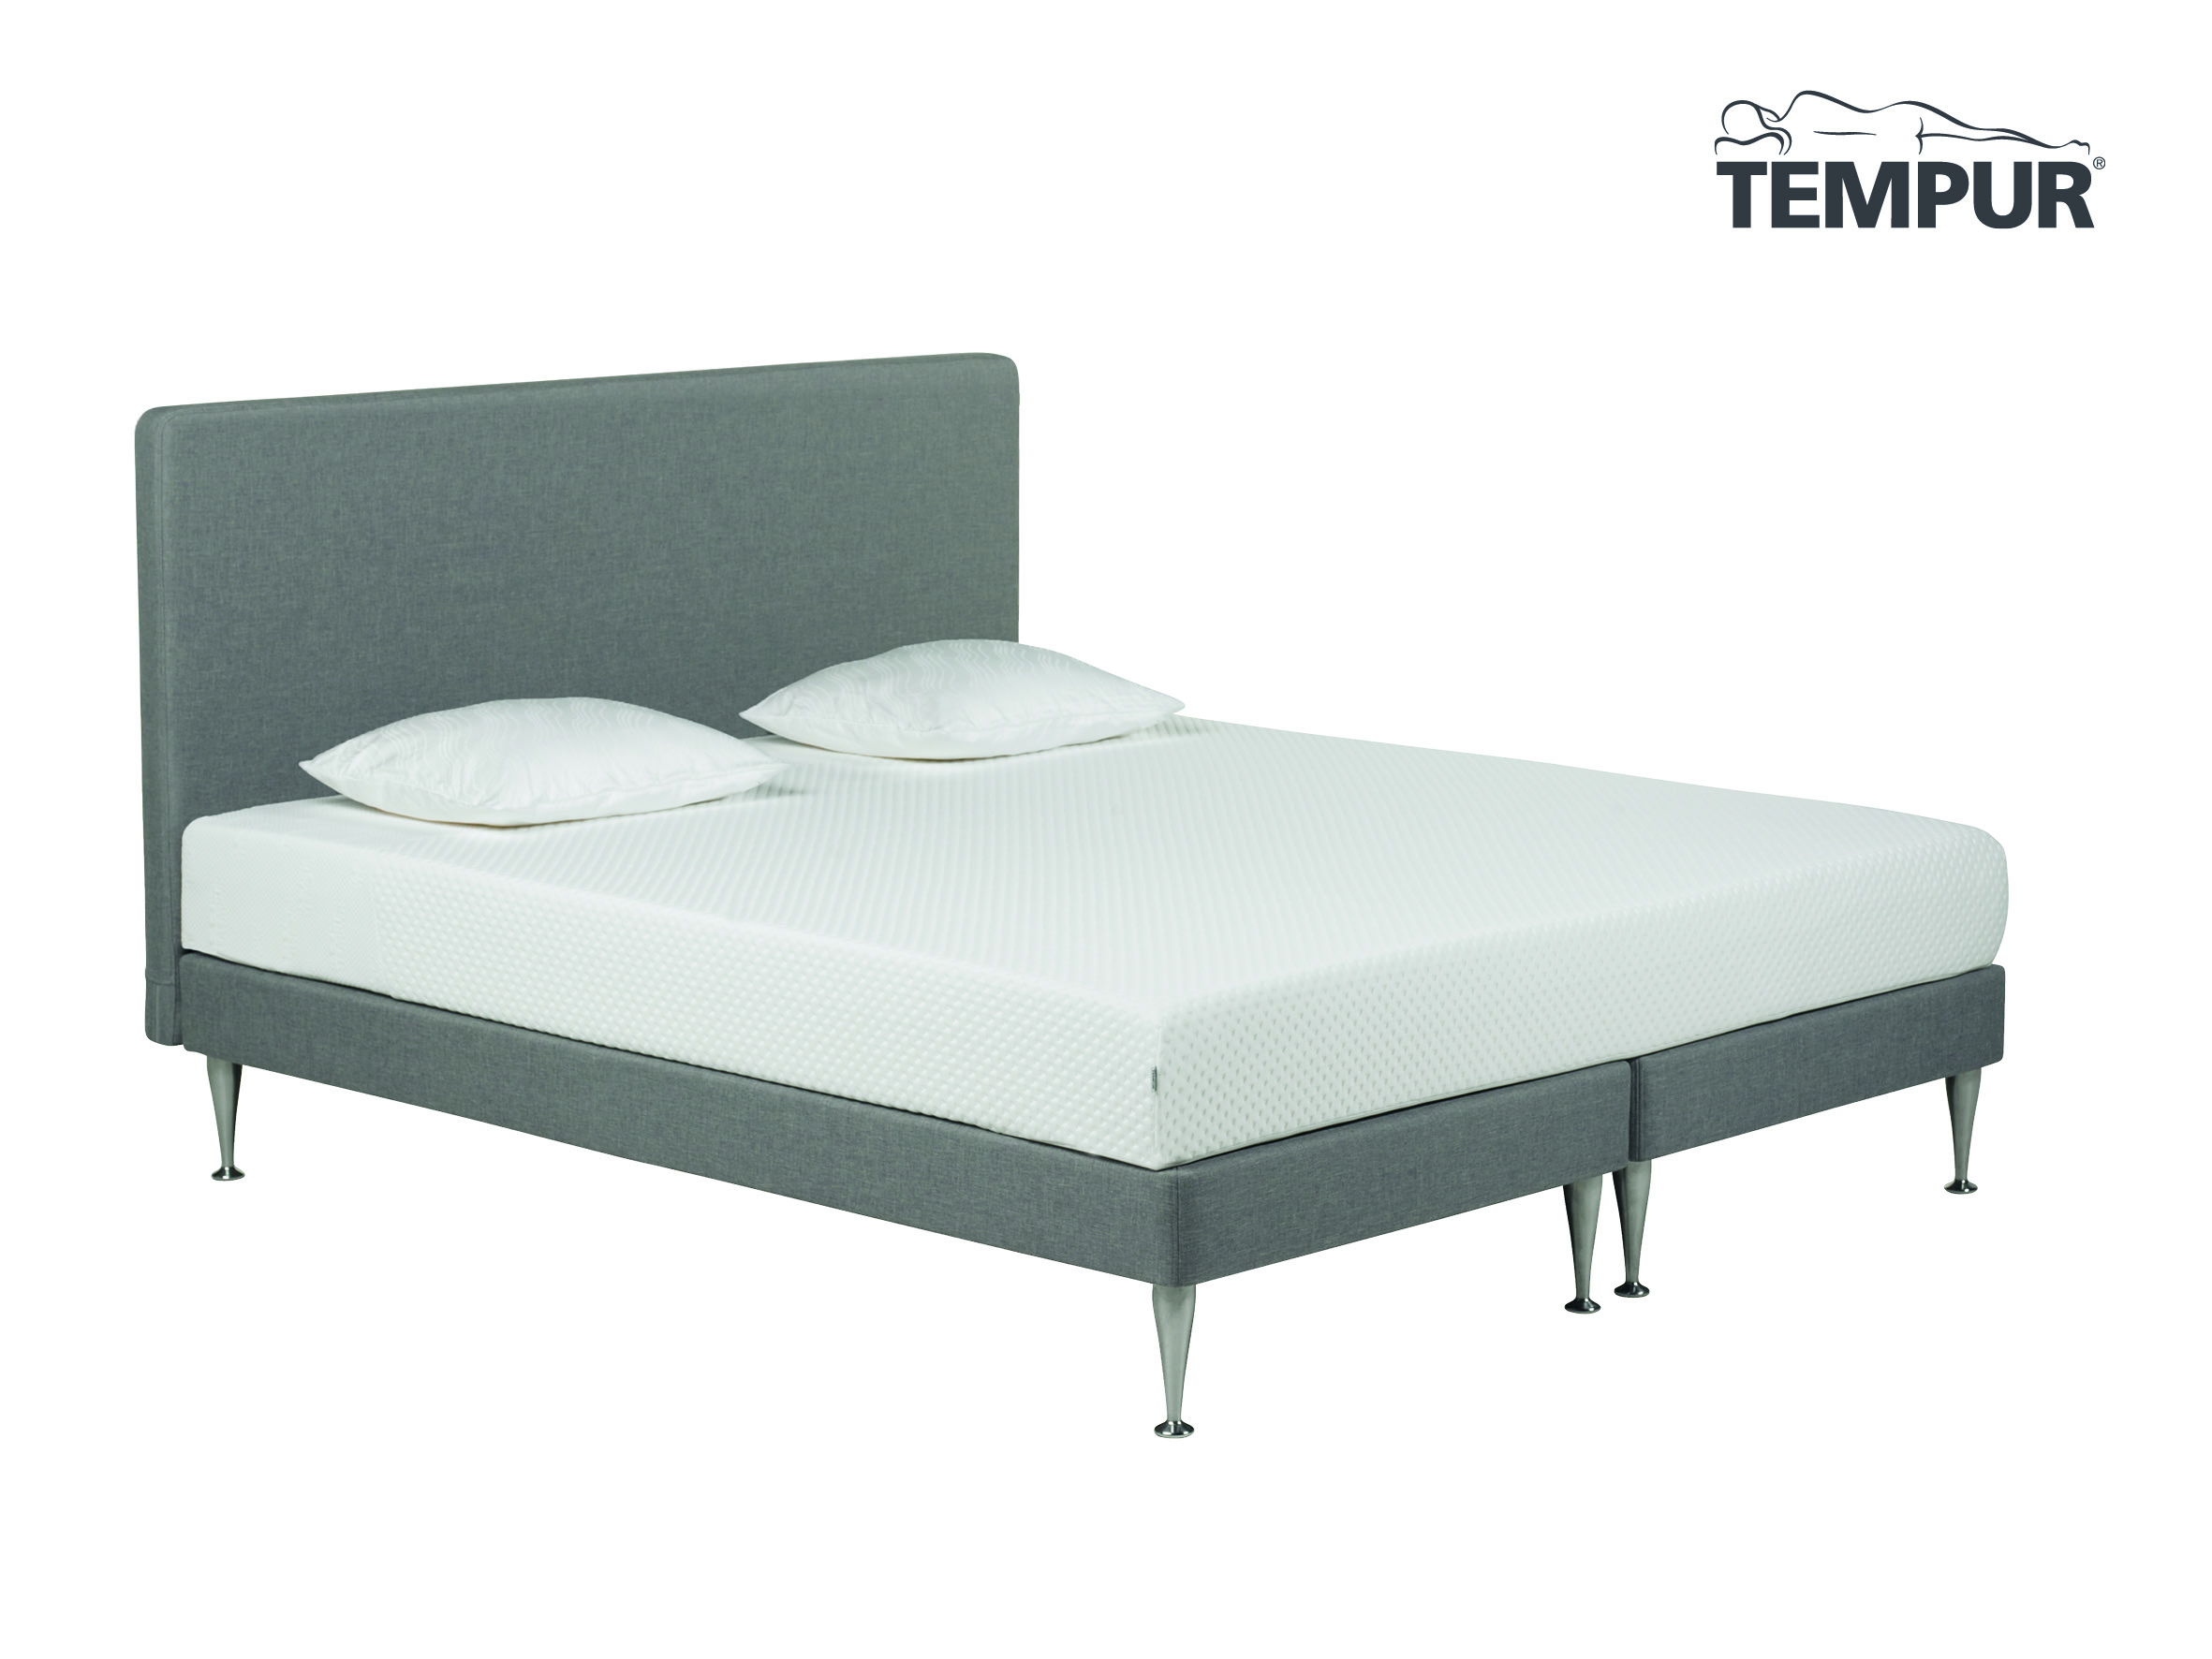 tempur stay 180x200 cm med elite cooltouch madras. Black Bedroom Furniture Sets. Home Design Ideas